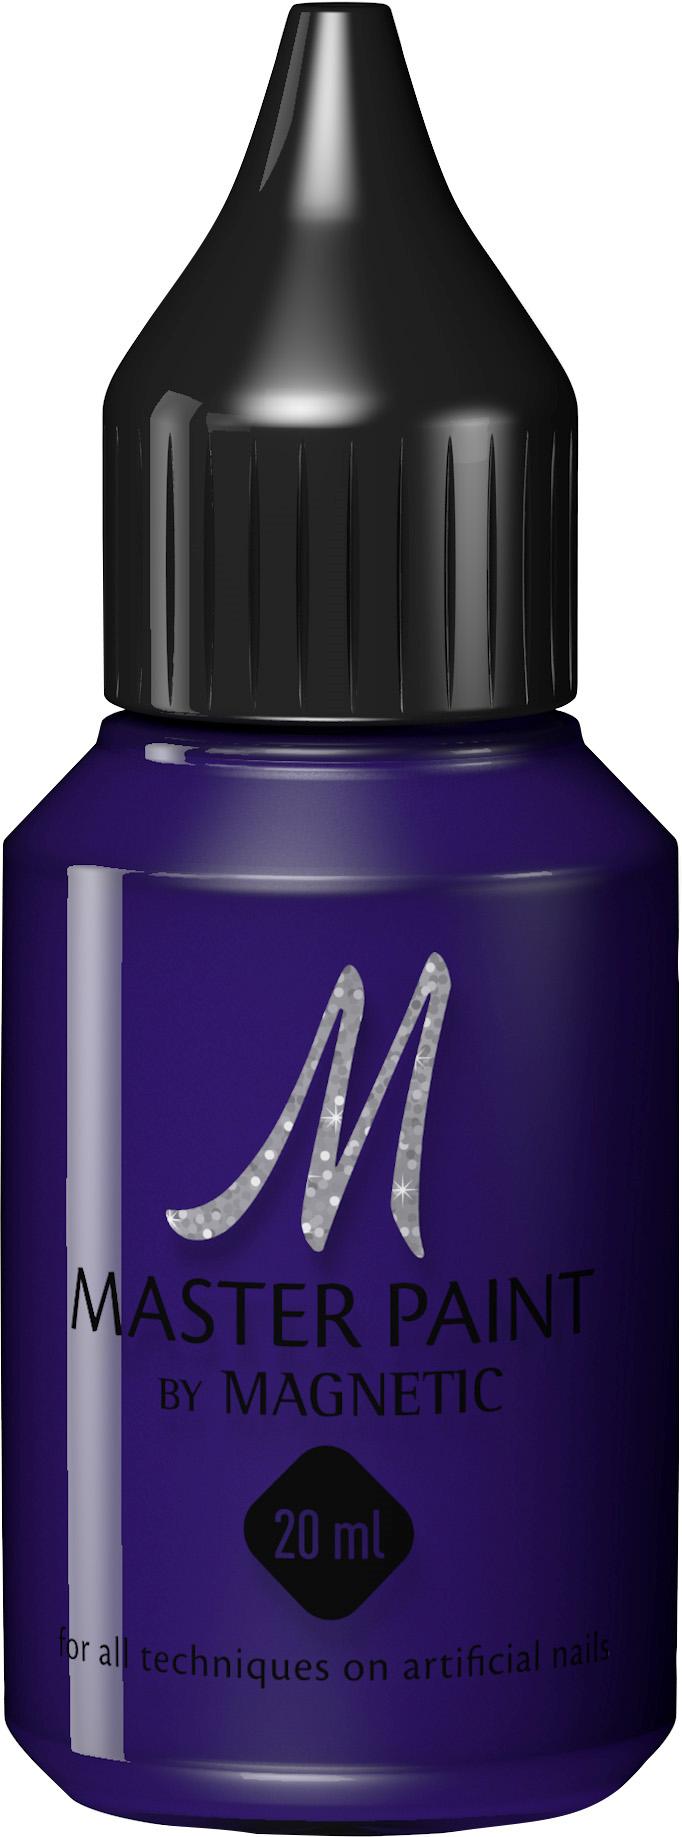 Naglar Master Paint Ultra Marin - 20 ml